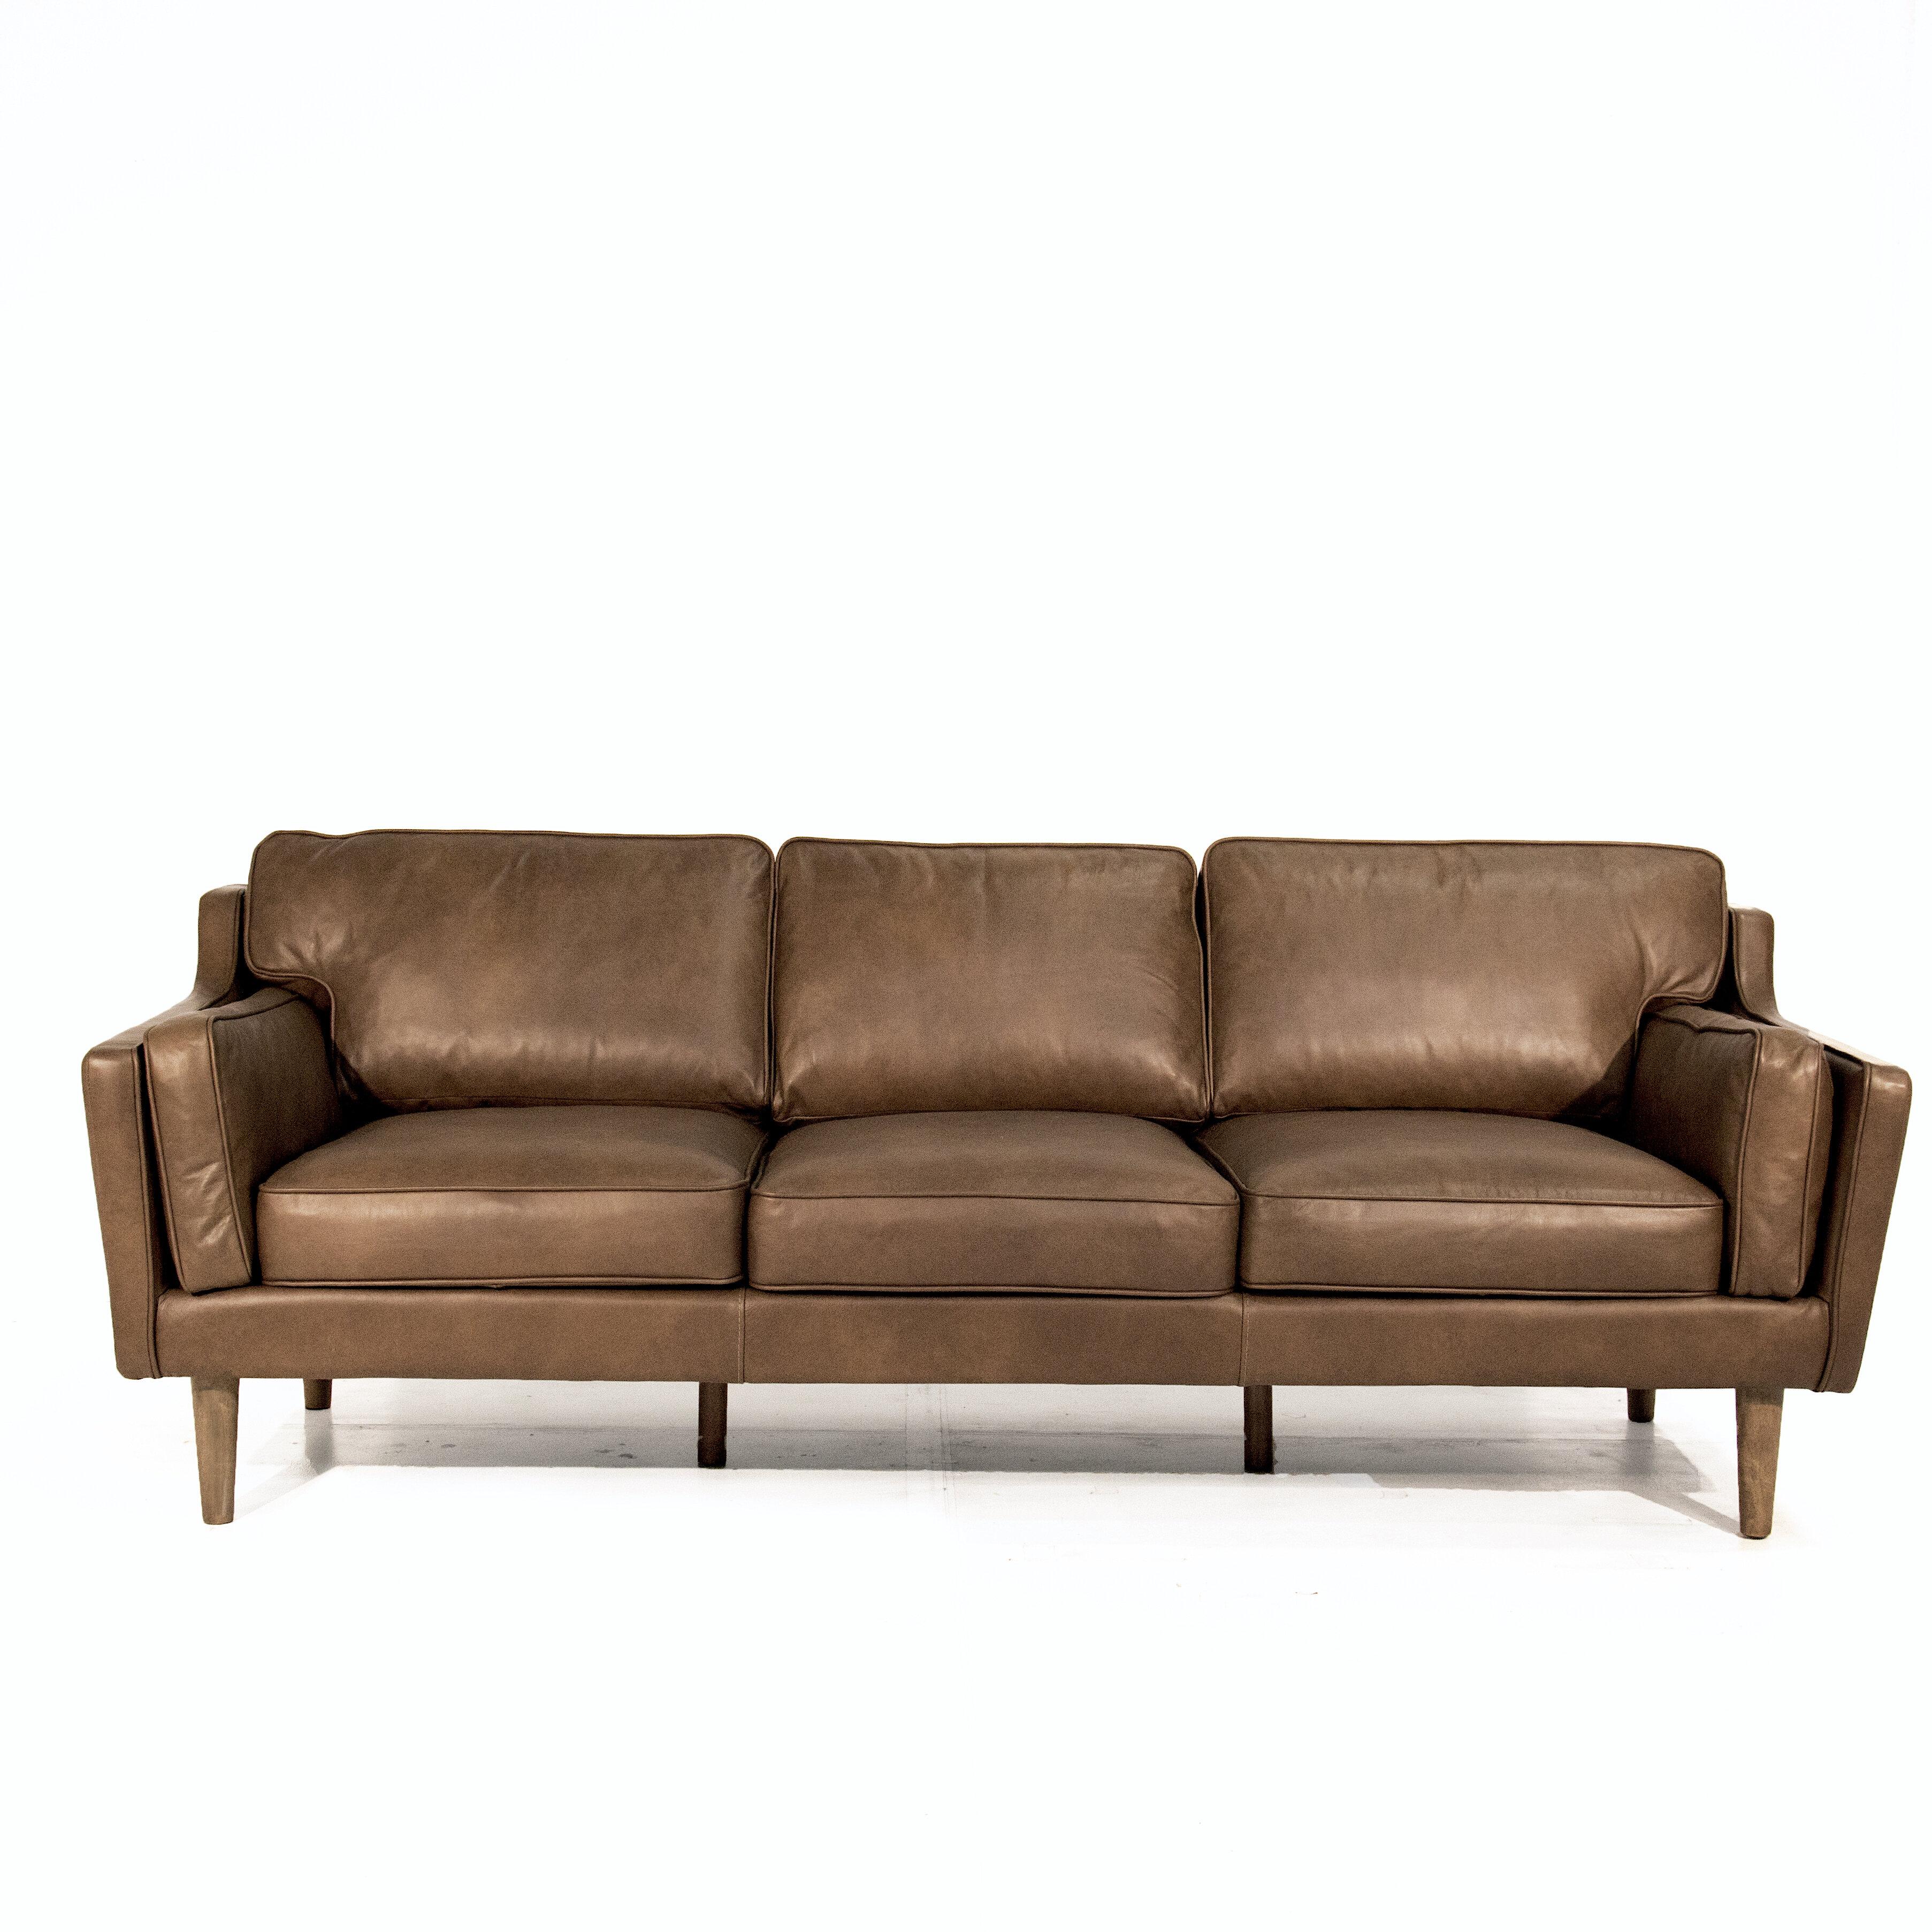 https://secure.img2-fg.wfcdn.com/im/77333782/compr-r85/5699/56990308/kaufman-mid-century-modern-leather-sofa.jpg